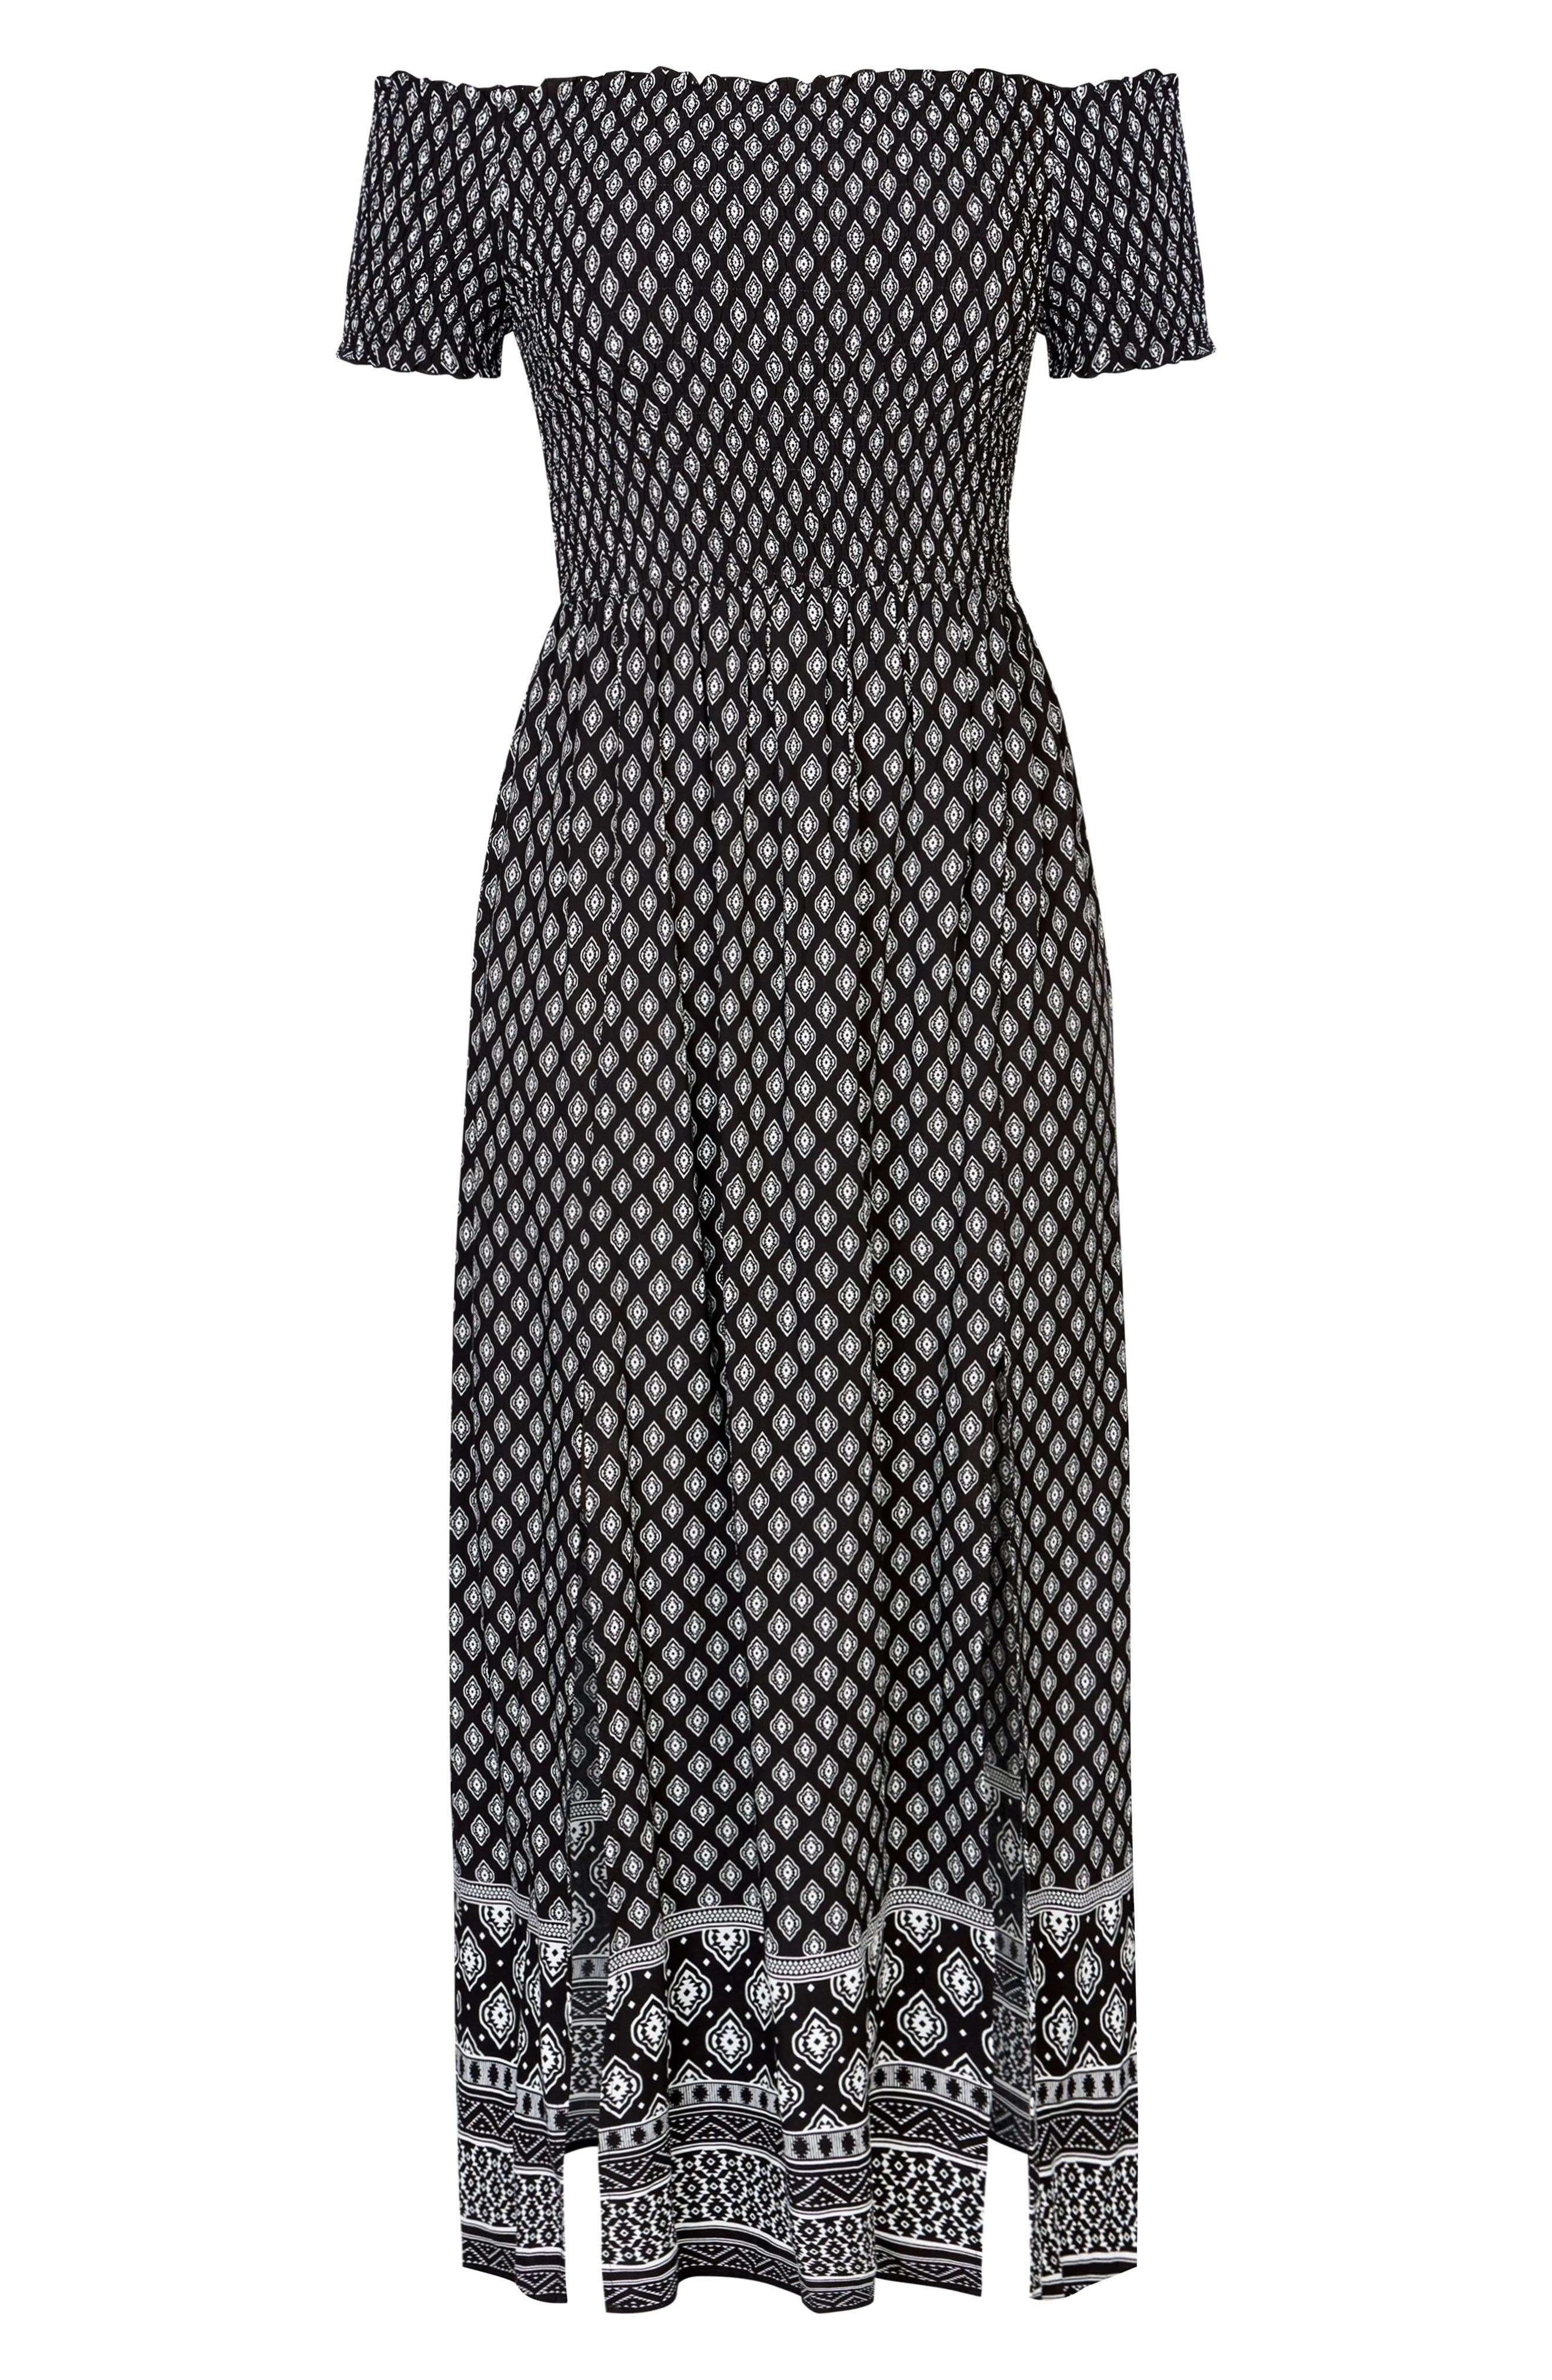 CITY CHIC, Smocked Off the Shoulder Maxi Dress, Alternate thumbnail 3, color, BLACK PRINT